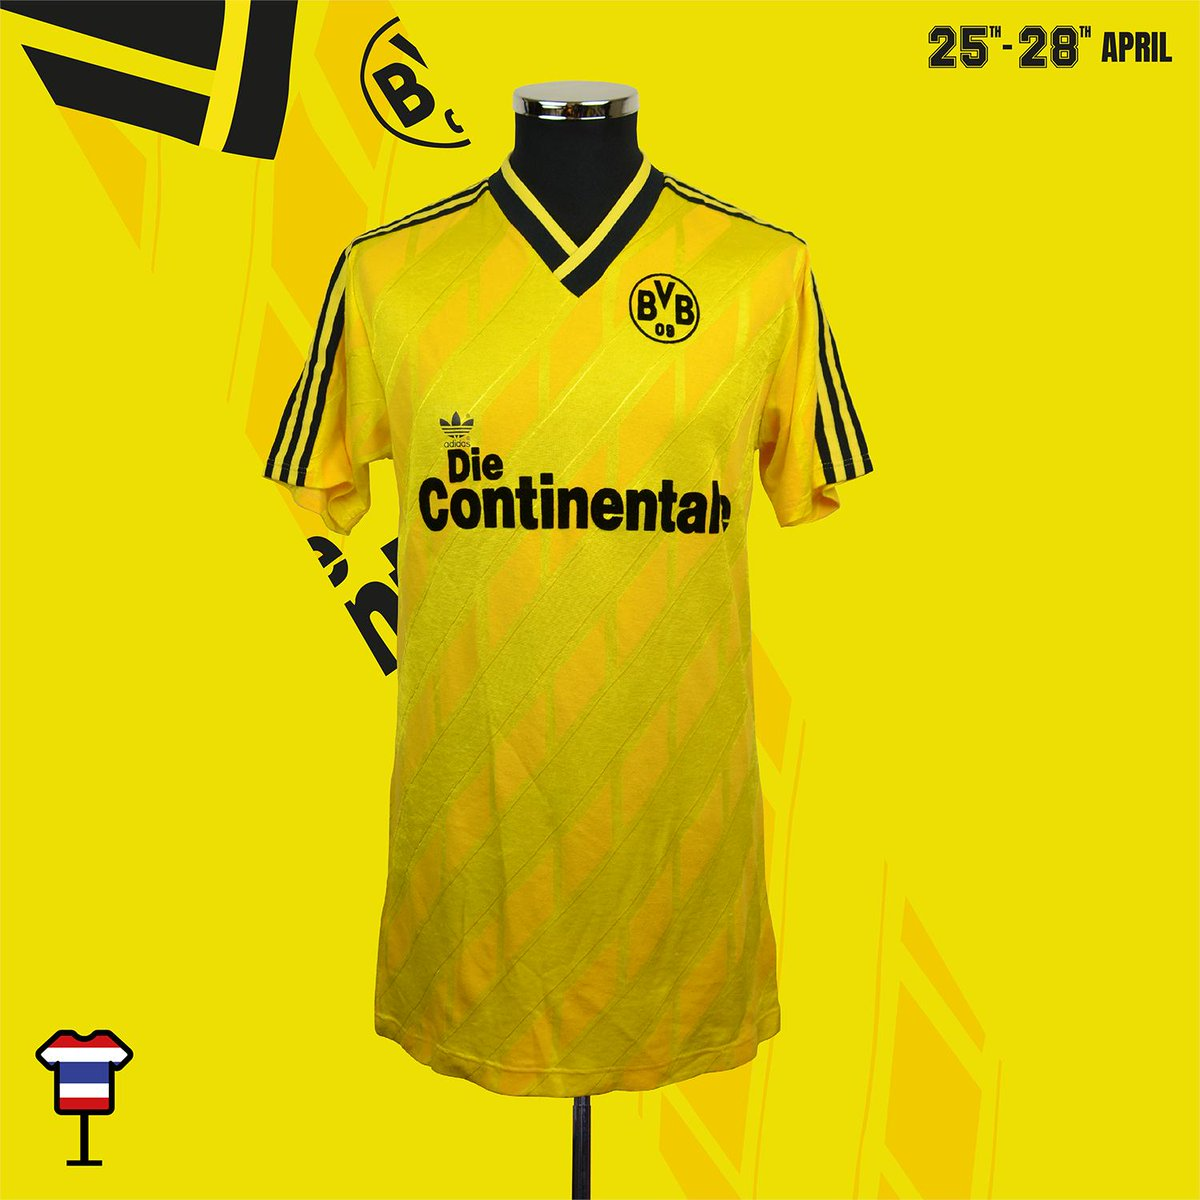 a6d20bac5 Classic Football Shirts on Twitter